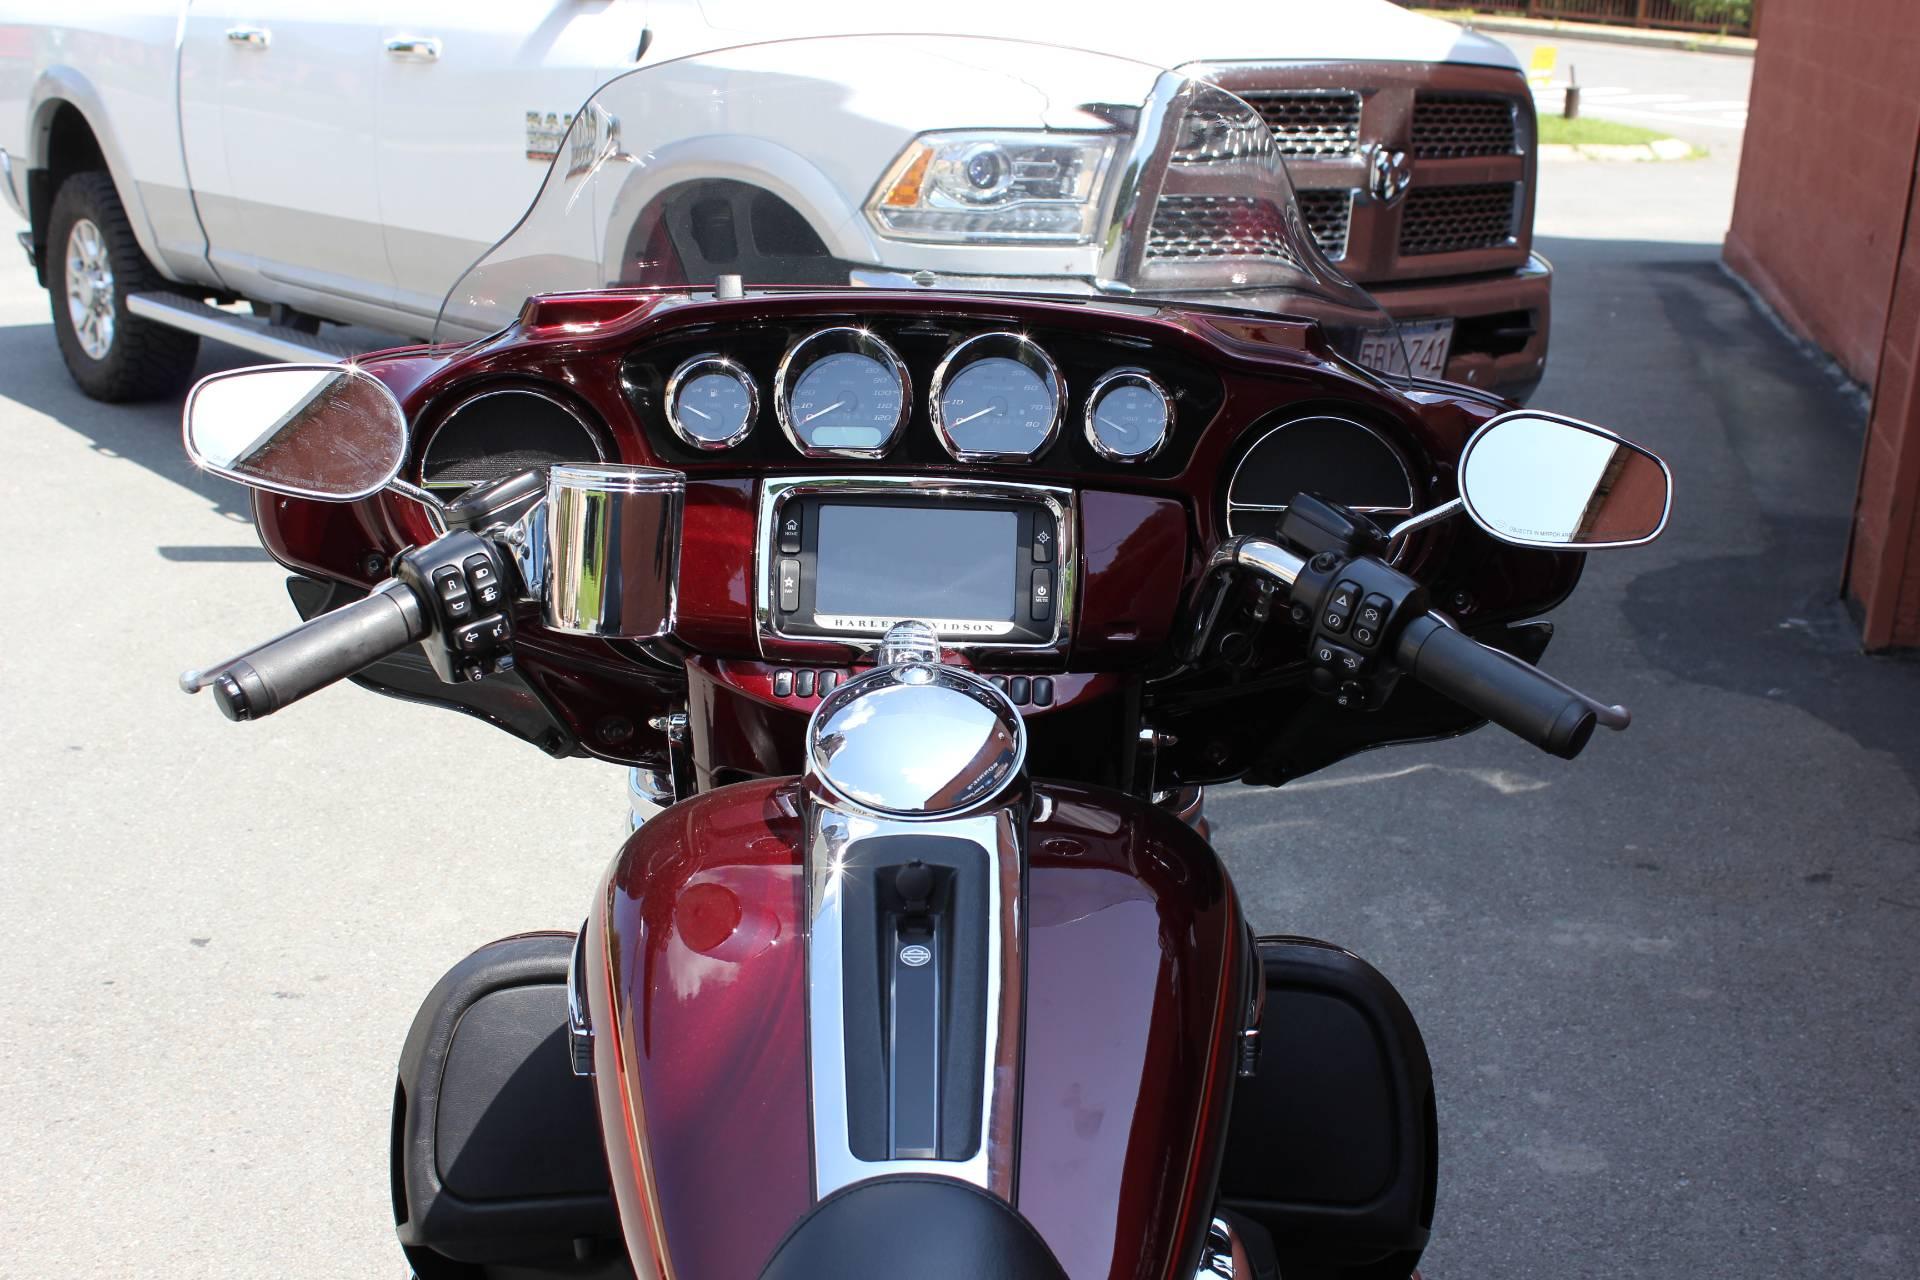 2016 Harley-Davidson Tri Glide® Ultra in Pittsfield, Massachusetts